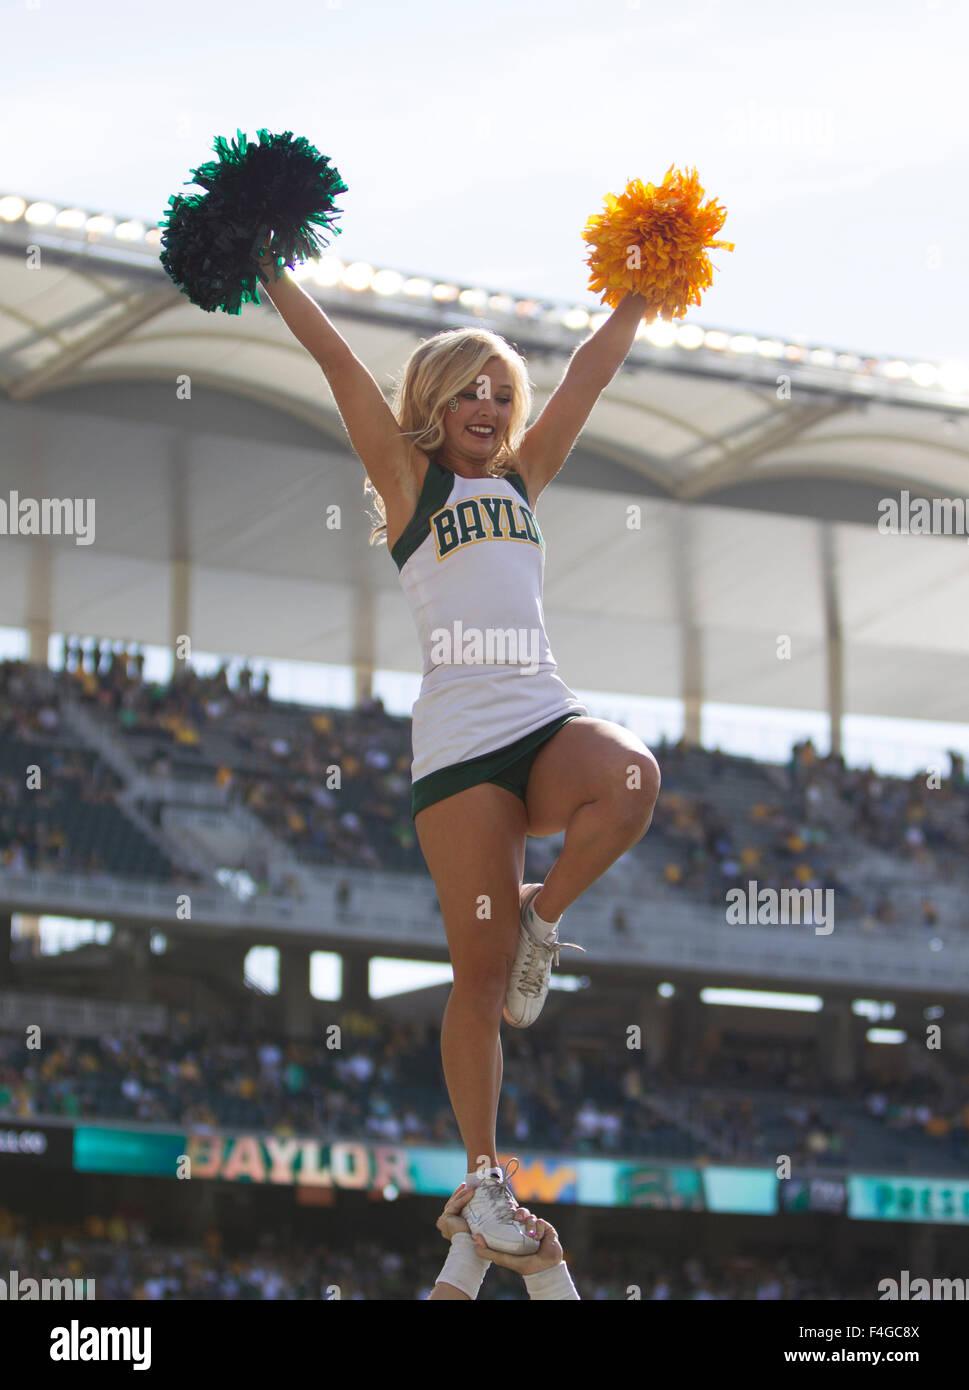 Waco, Texas, USA. 17th Oct, 2015. Baylor Bears cheerleader during the NCAA football game between the West Virginia Mountaineers and Baylor Bears at McLane Stadium in Waco, Texas. JP Waldron/Cal Sport Media/Alamy Live News Stock Photo